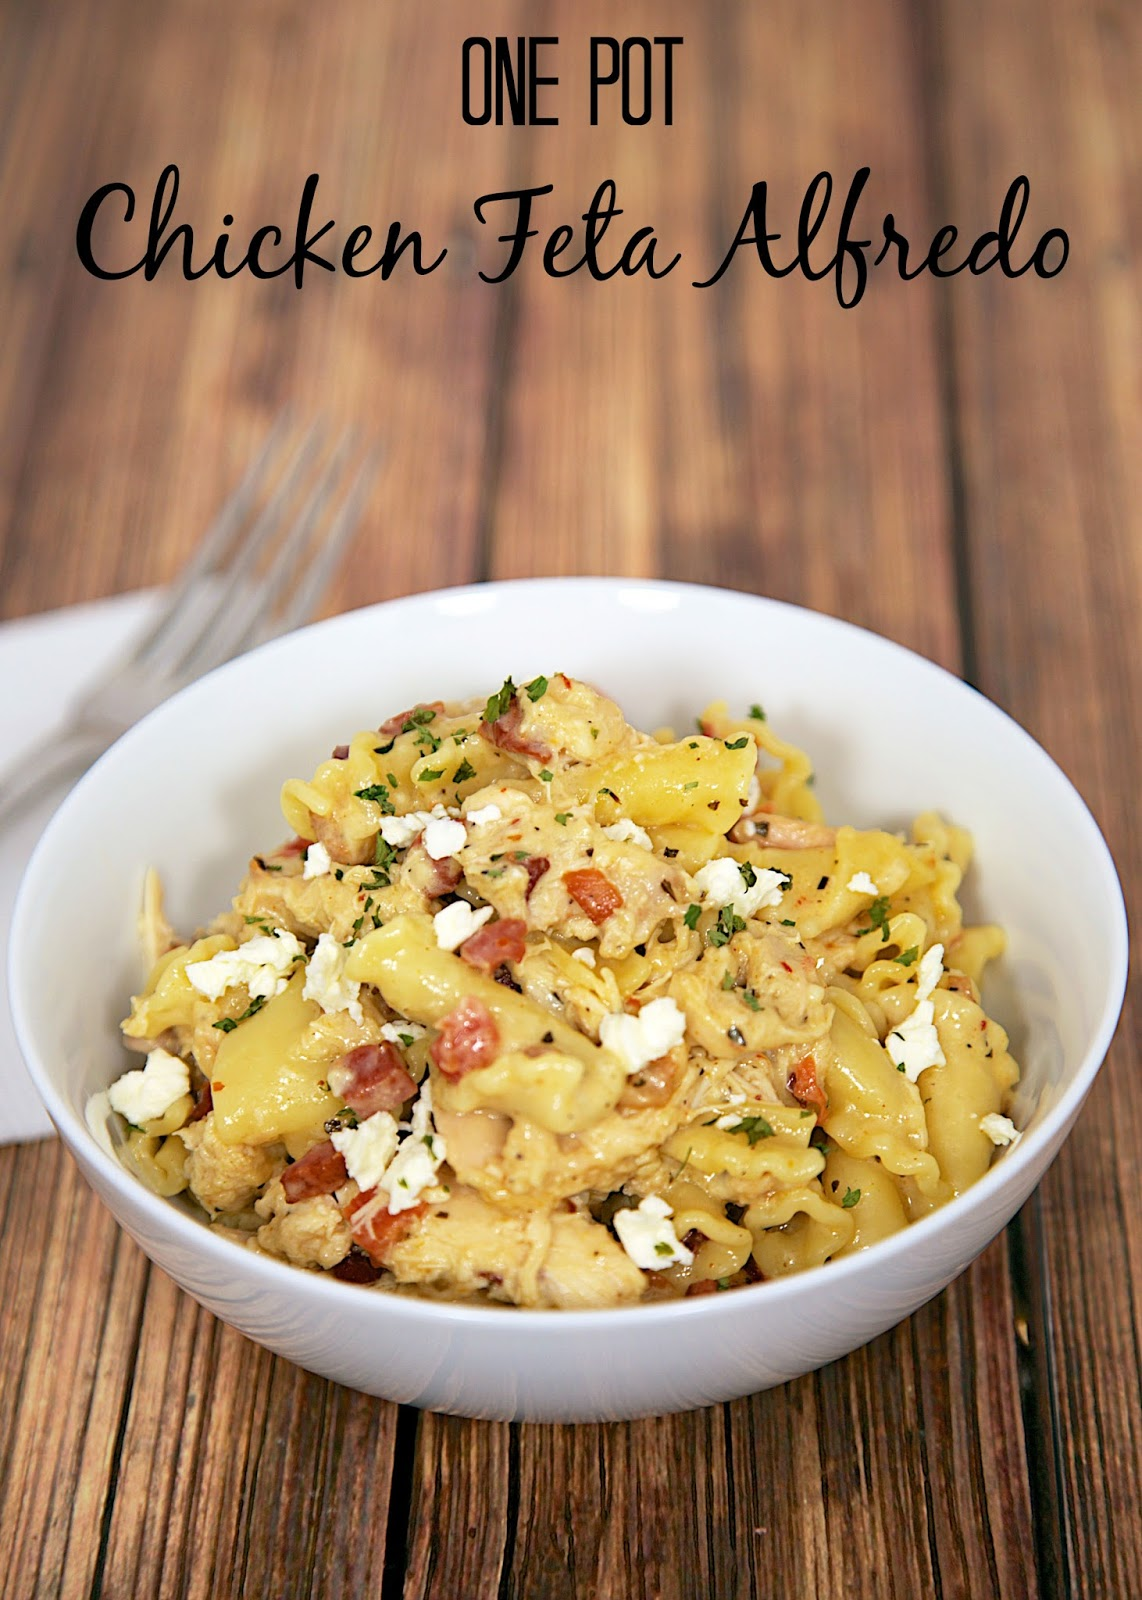 One Pot Chicken Feta Alfredo